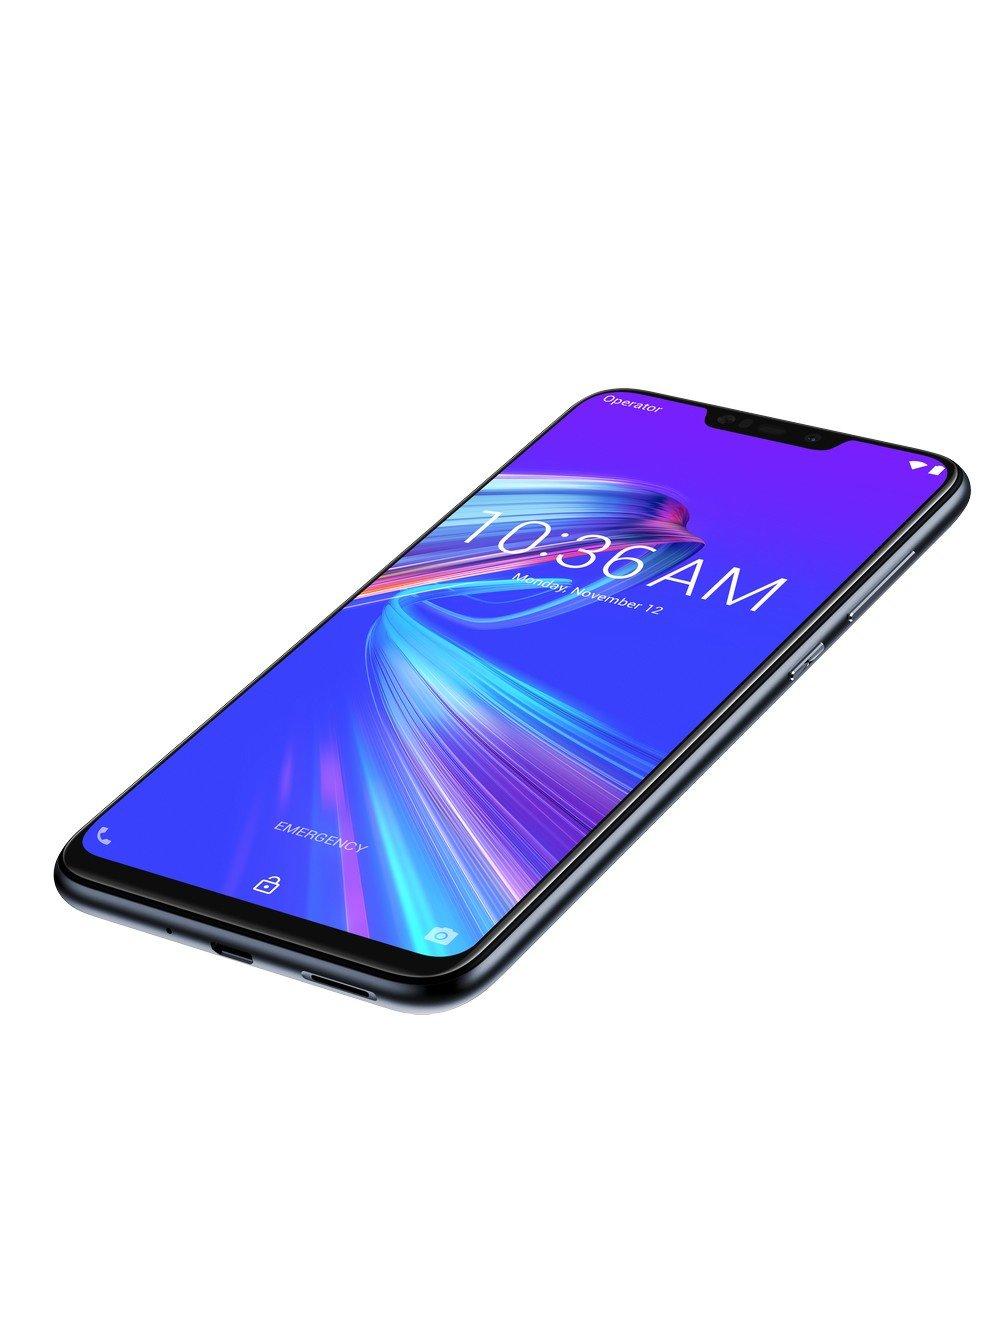 Смартфон Asus ZenFone Max (M2) (ZB633KL-4A070EU) 4/32 GB DUALSIM Black с чехлом фото 7